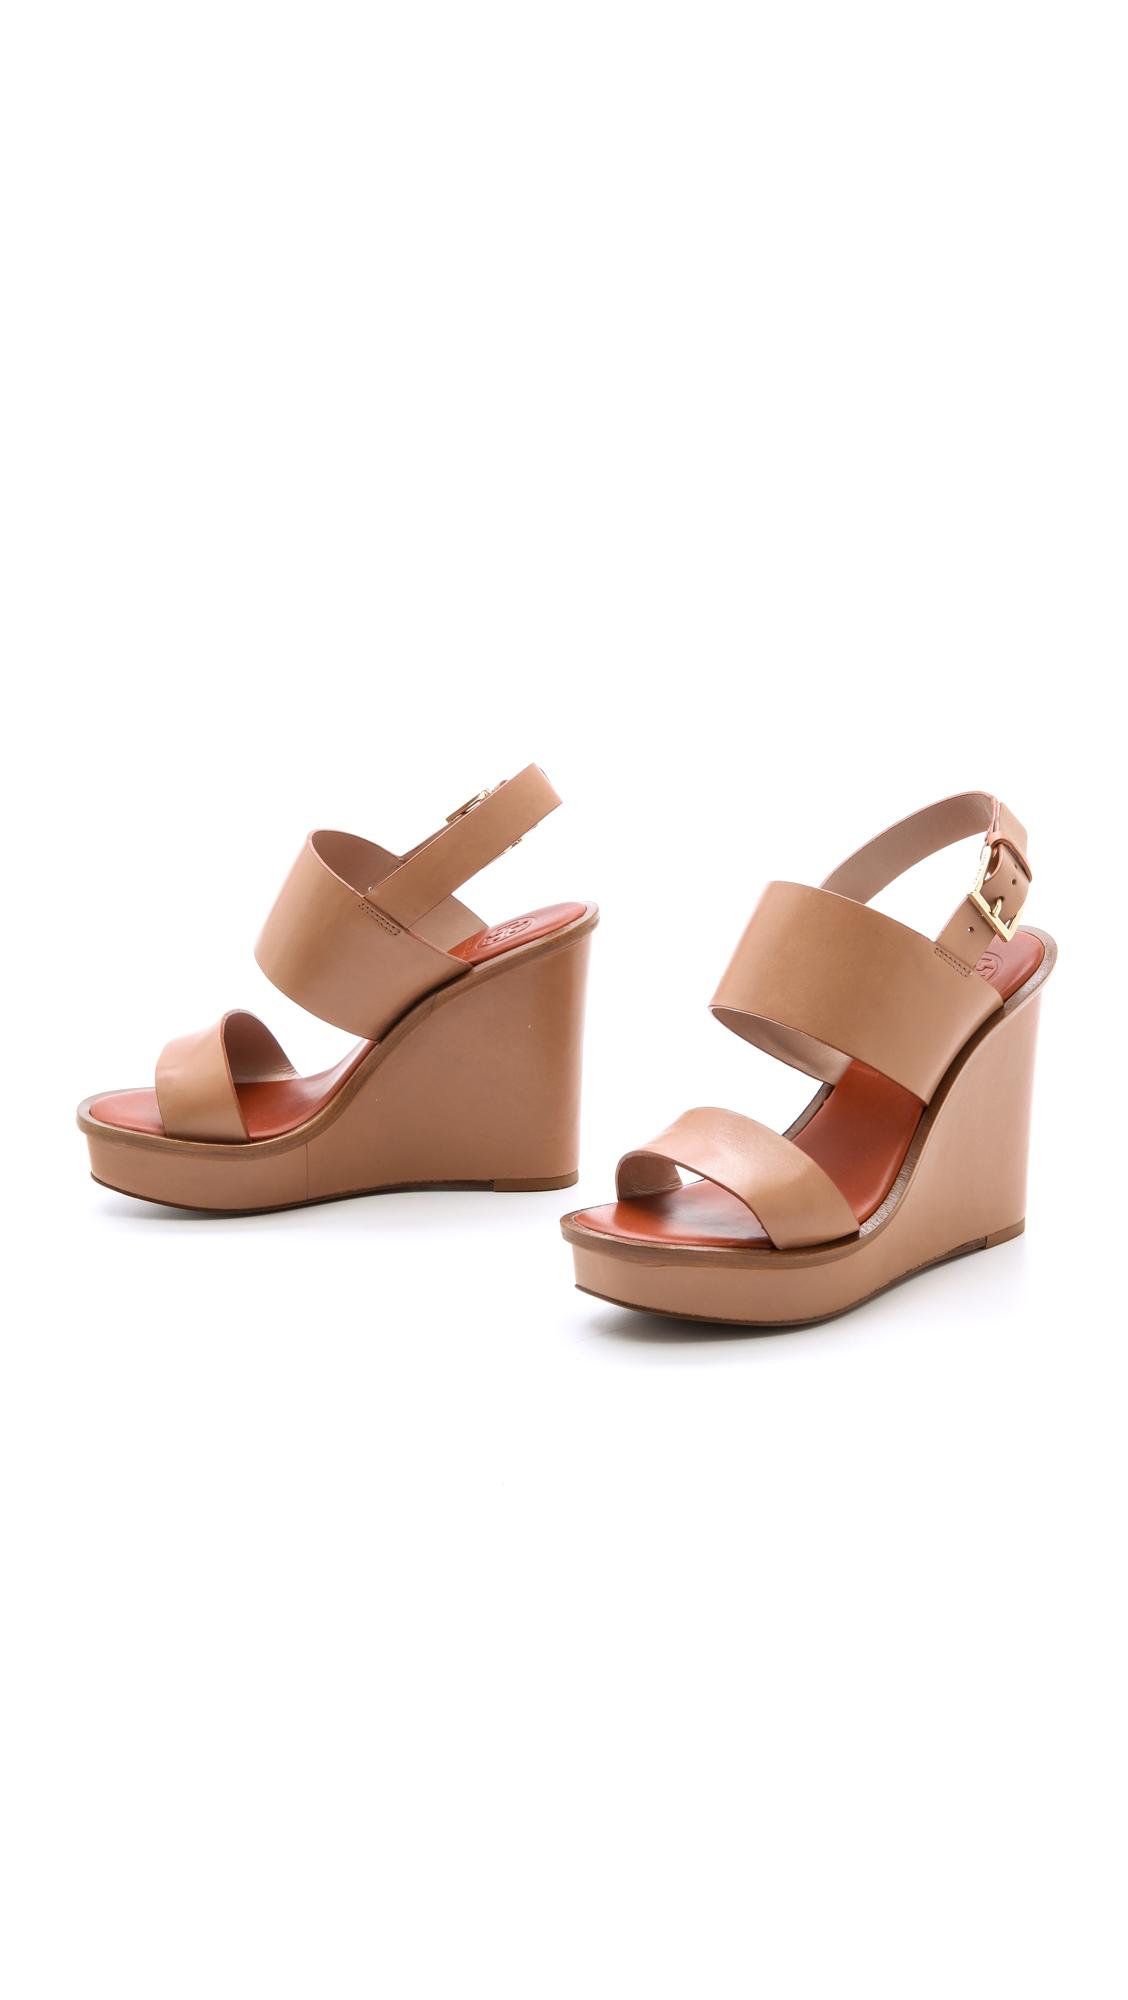 0f398b622dd634 Tory Burch Lexington Wedge Sandals